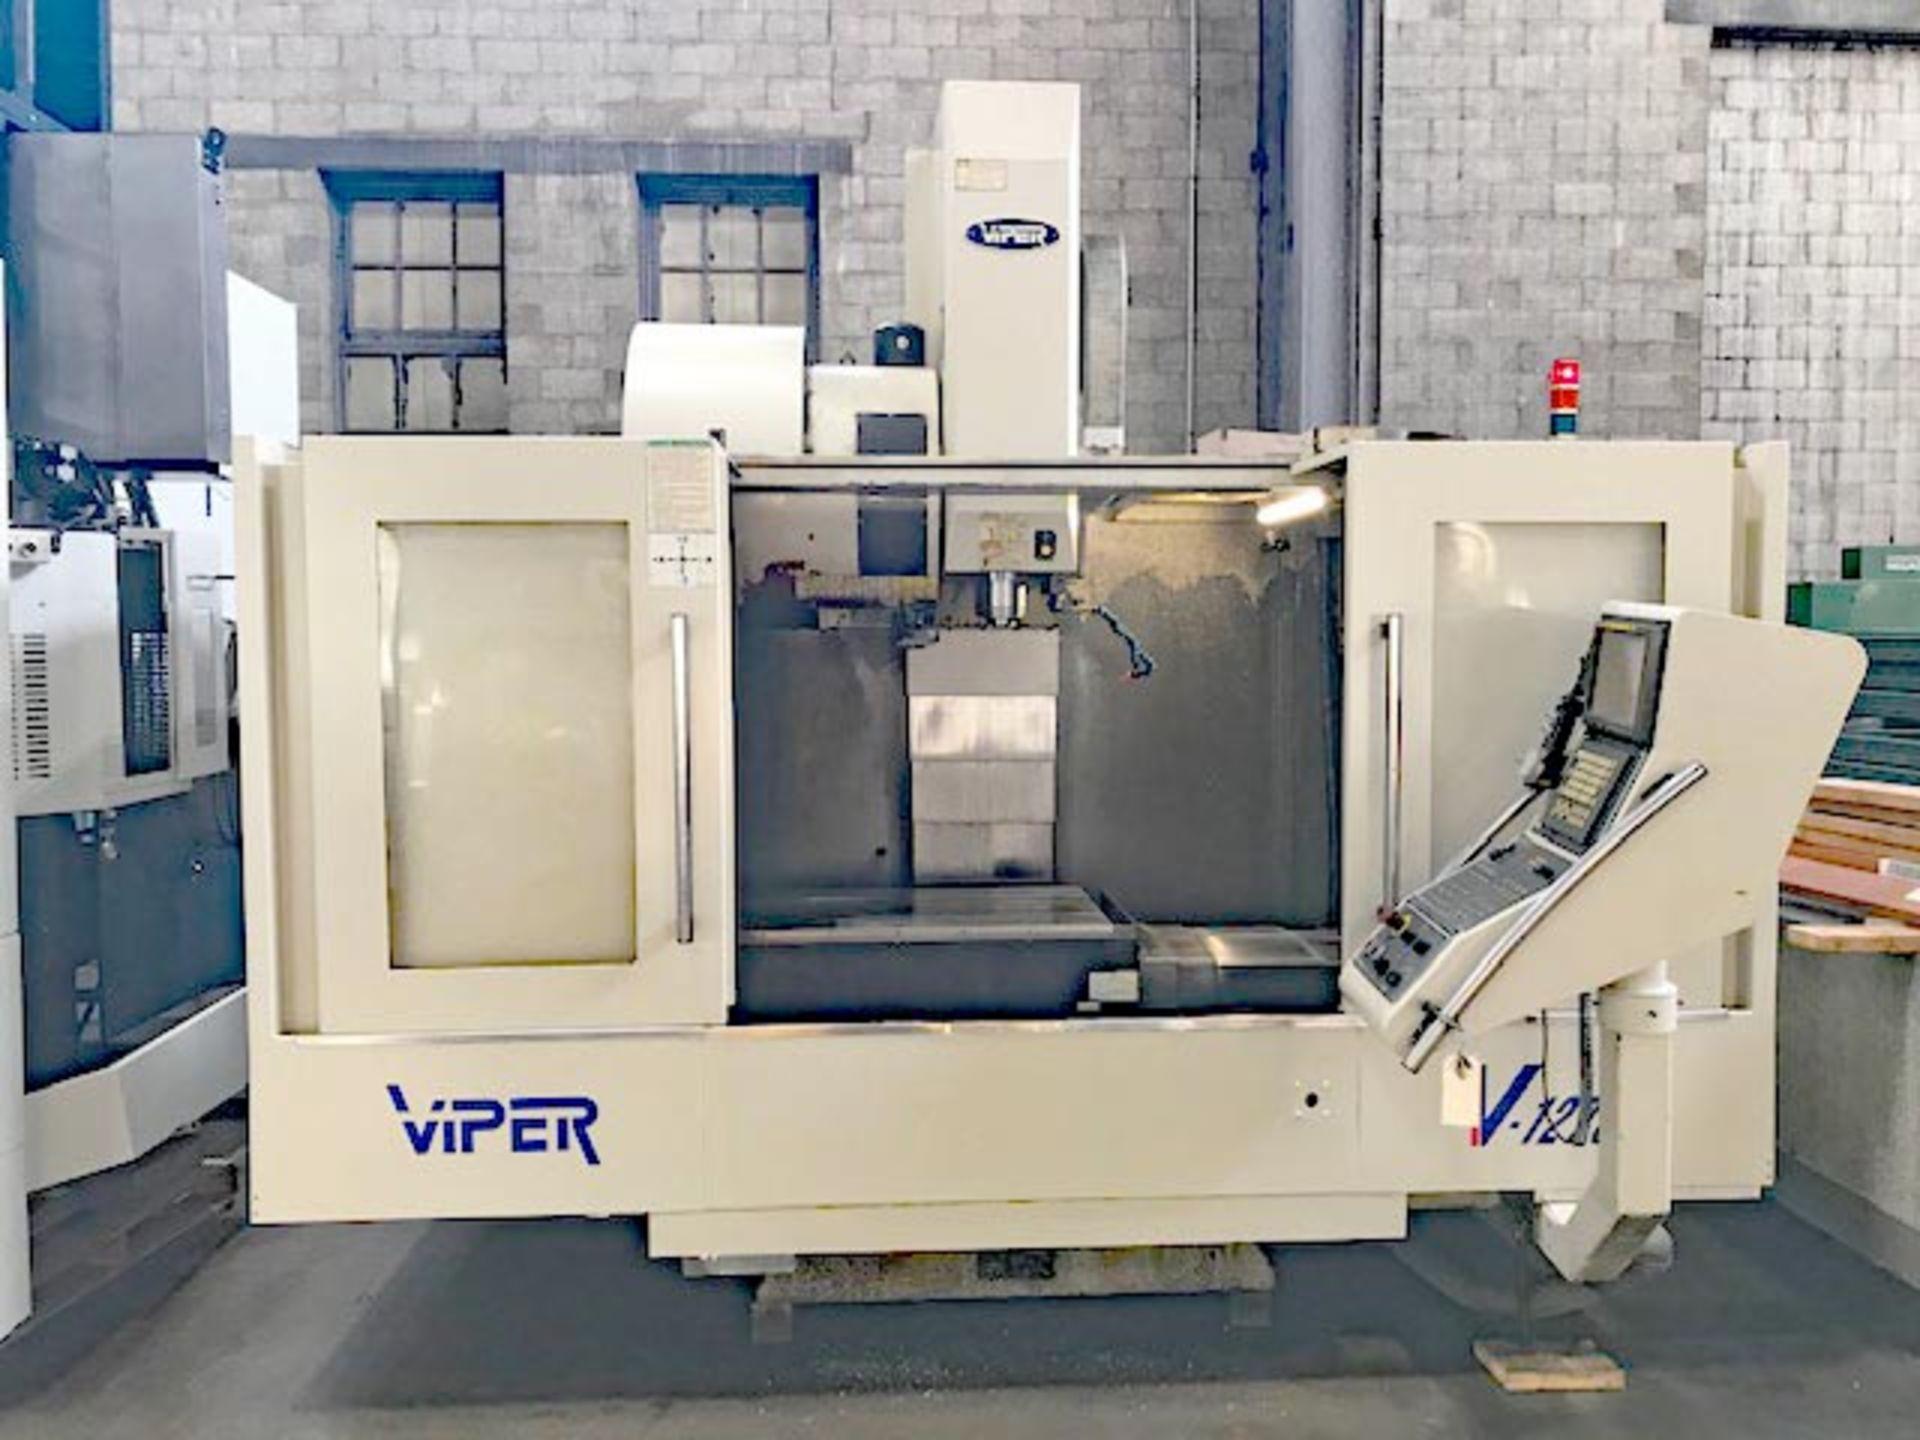 MIGHTY VIPER MODEL VMC-1270 CNC VMC, YEAR 2004, SN 005616 - Image 7 of 8